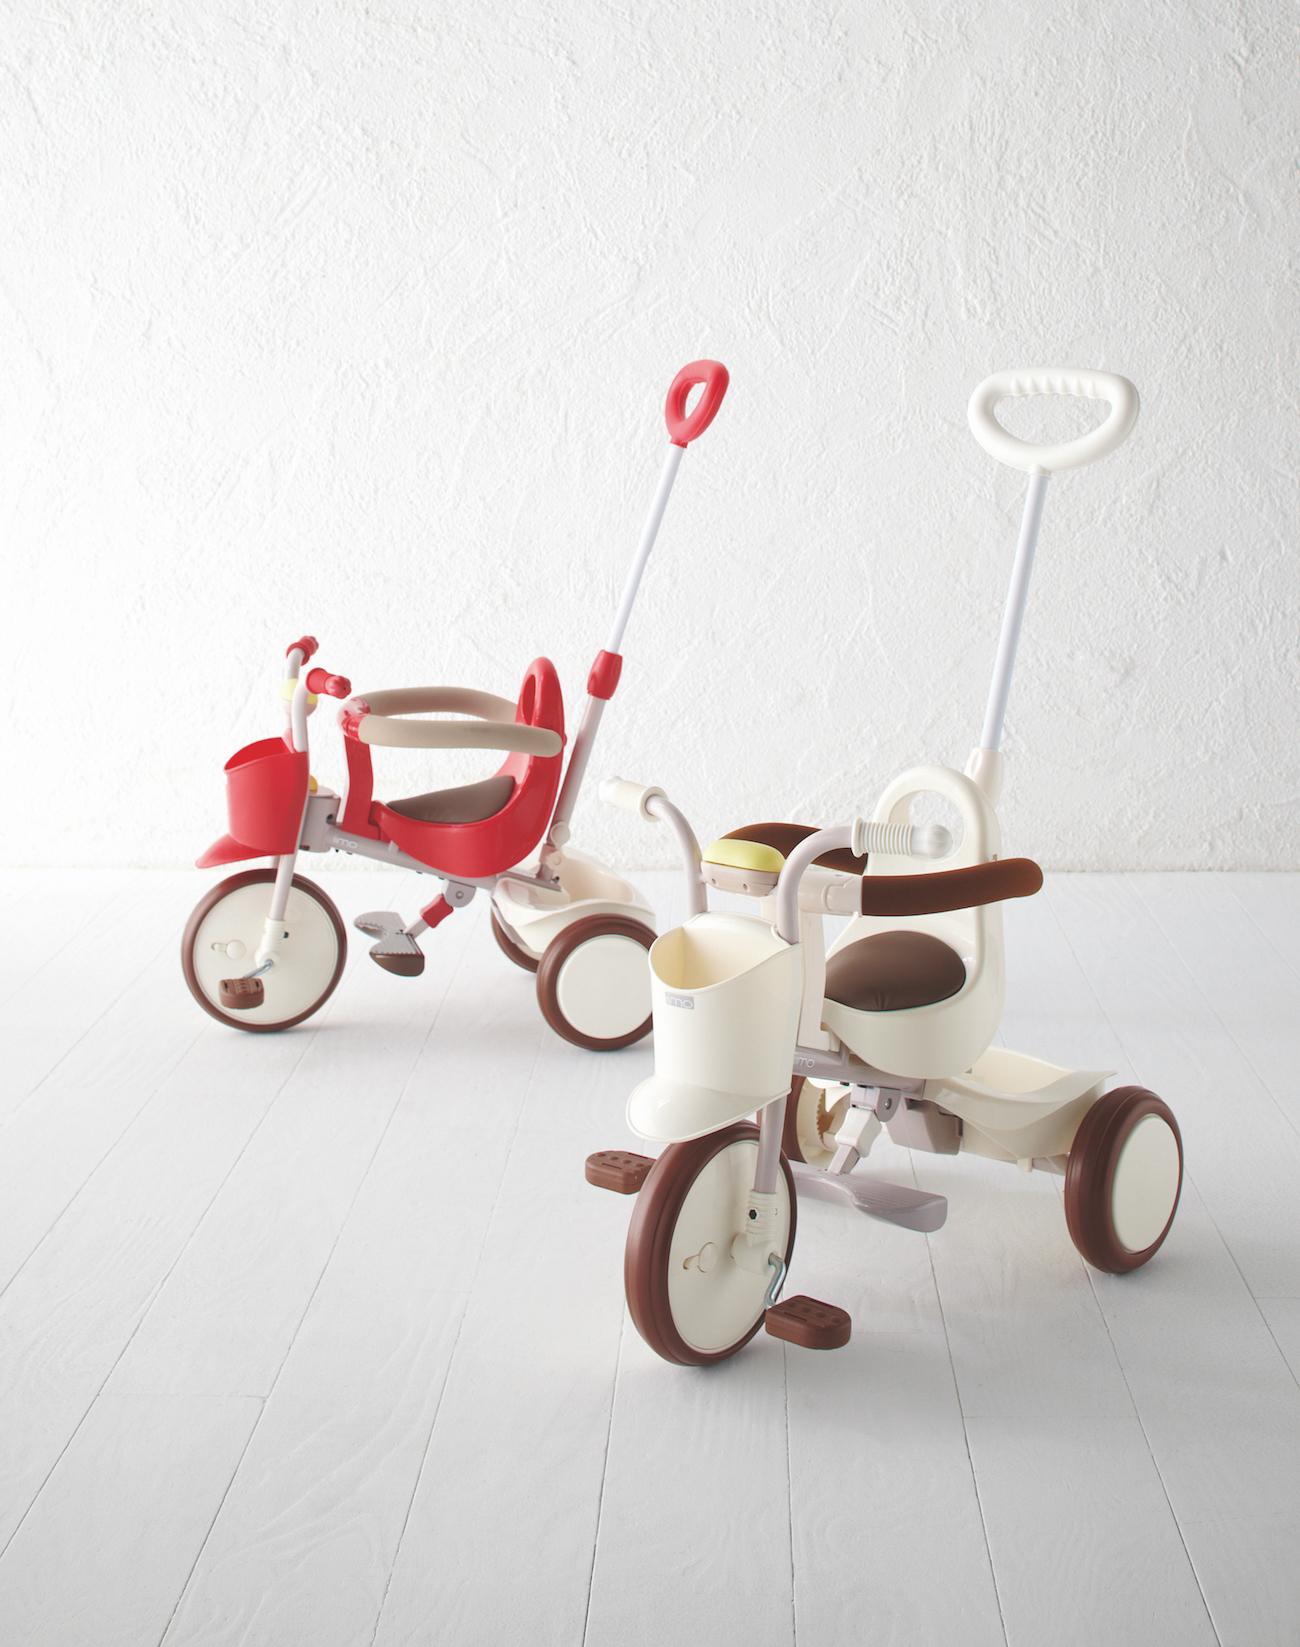 IIMO rowerek trójkołowy